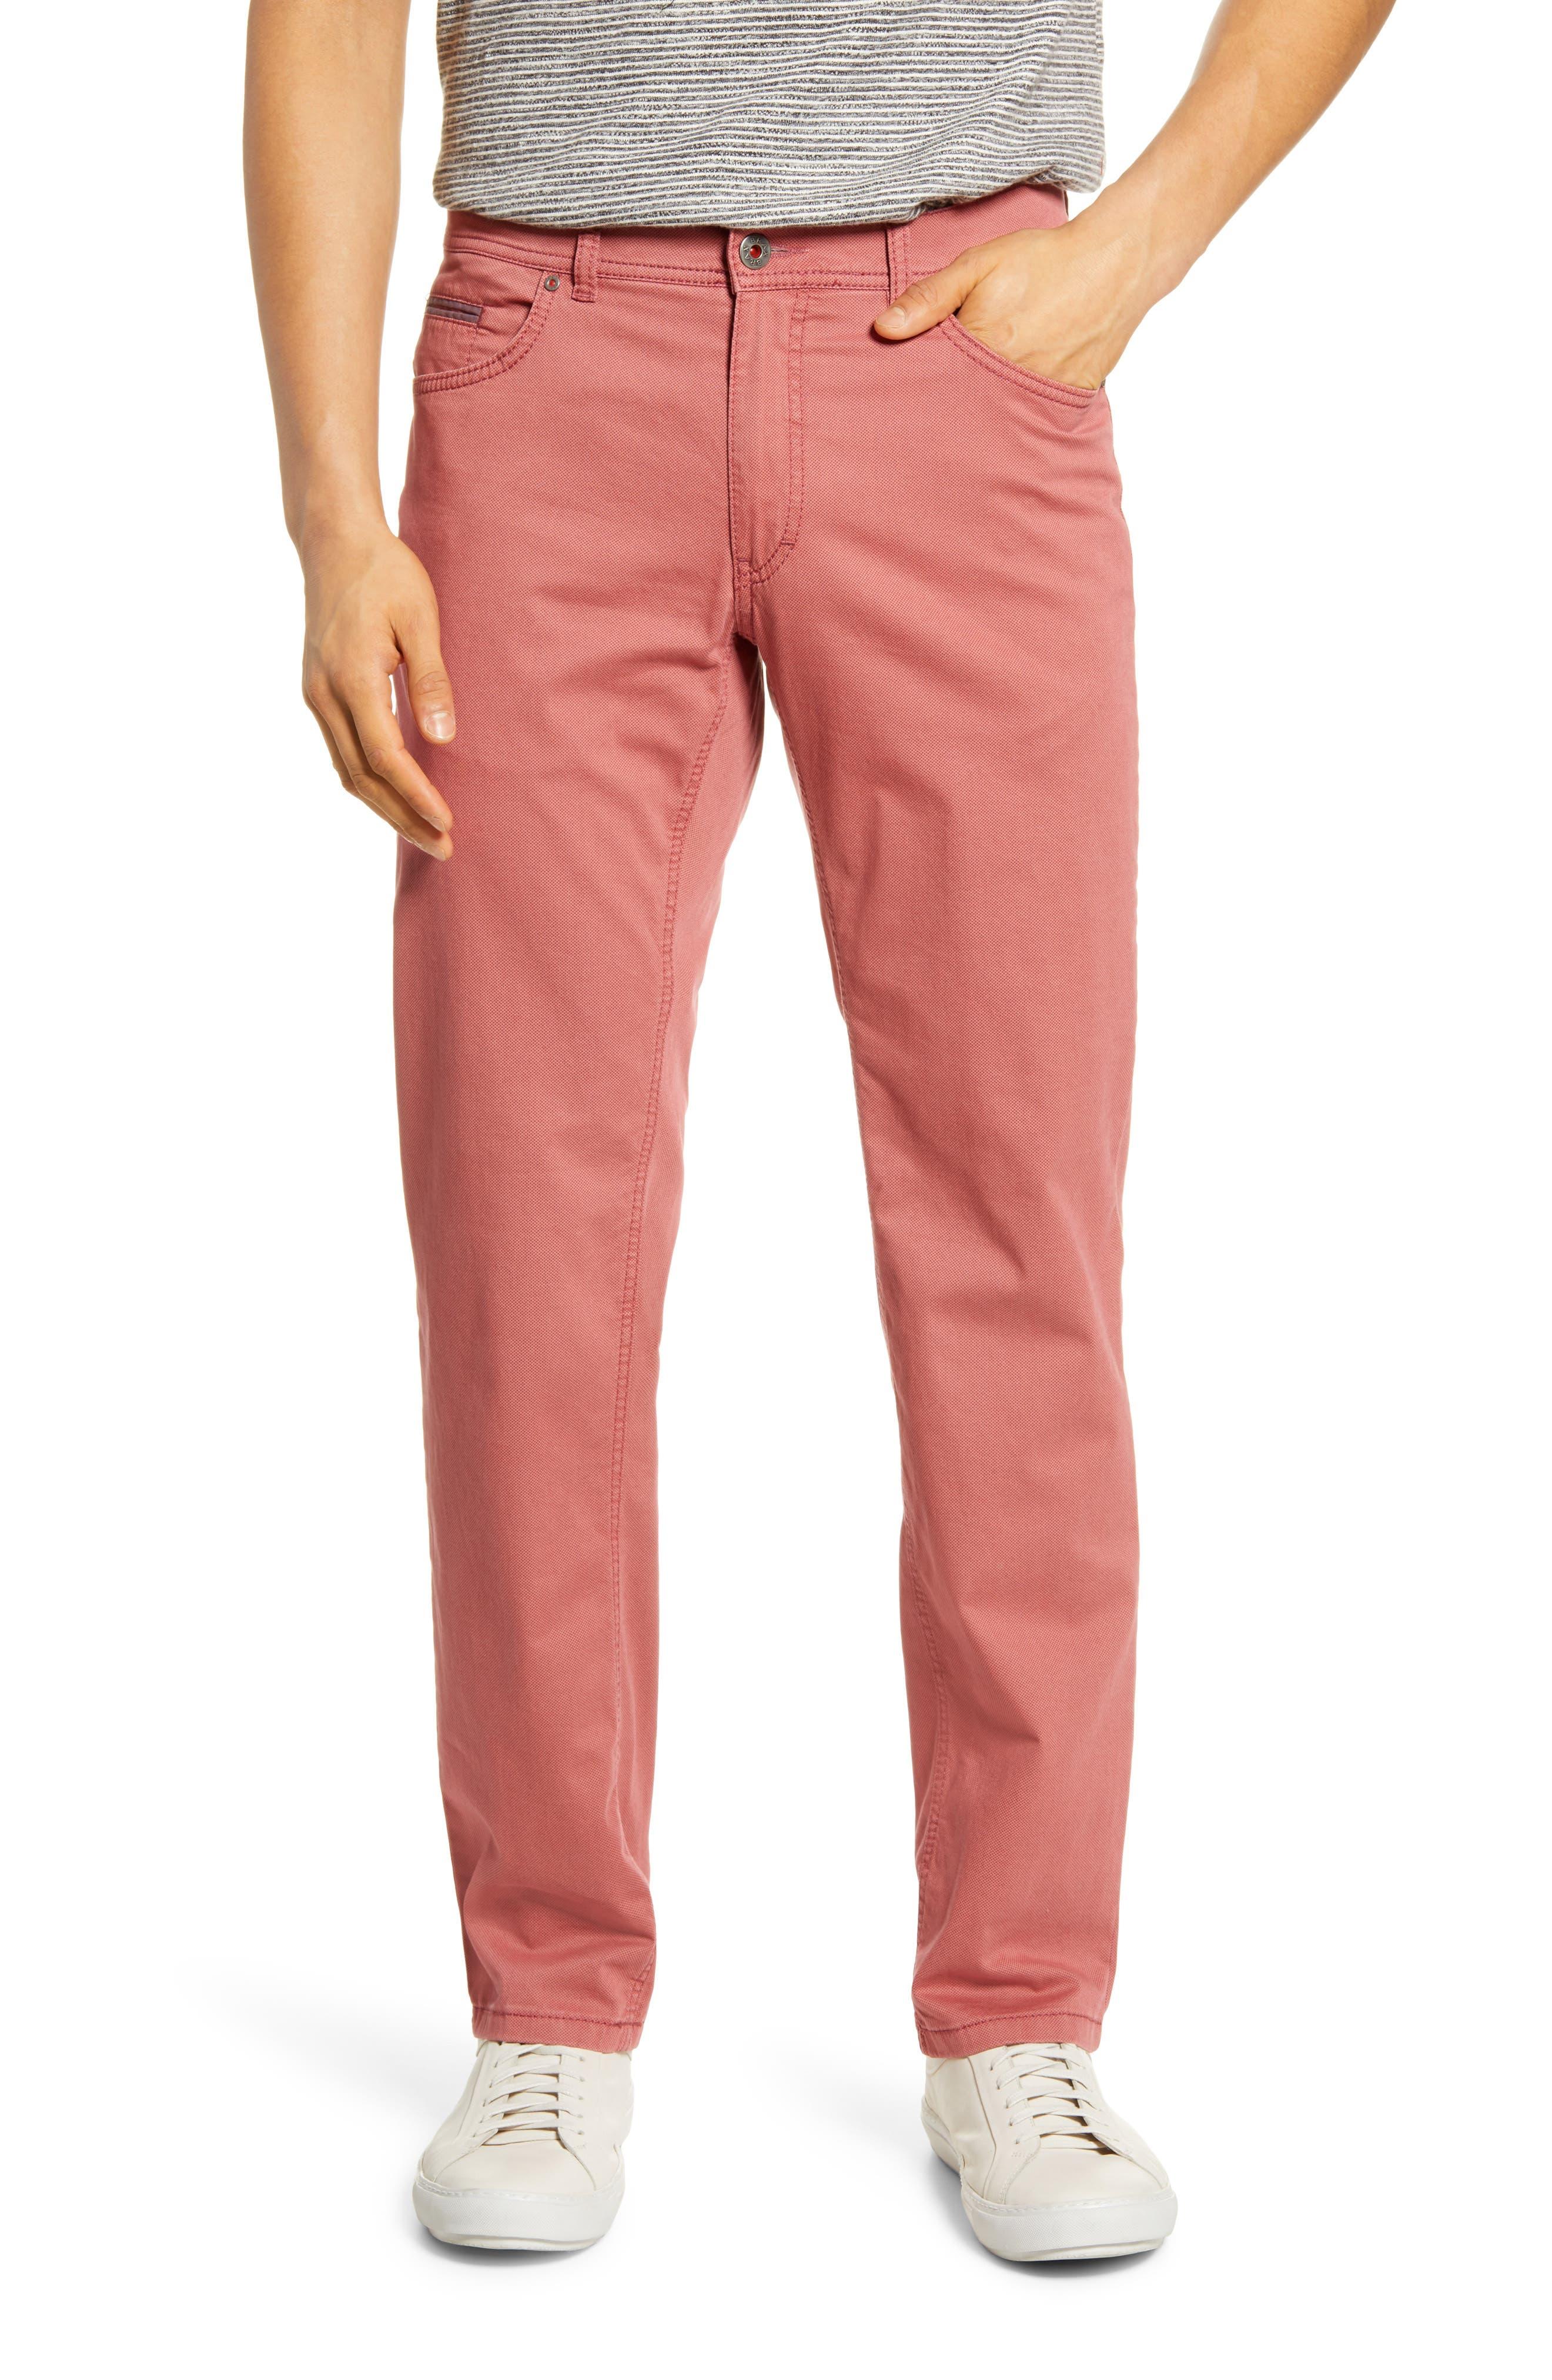 Cooper Five Pocket Stretch Cotton Pants